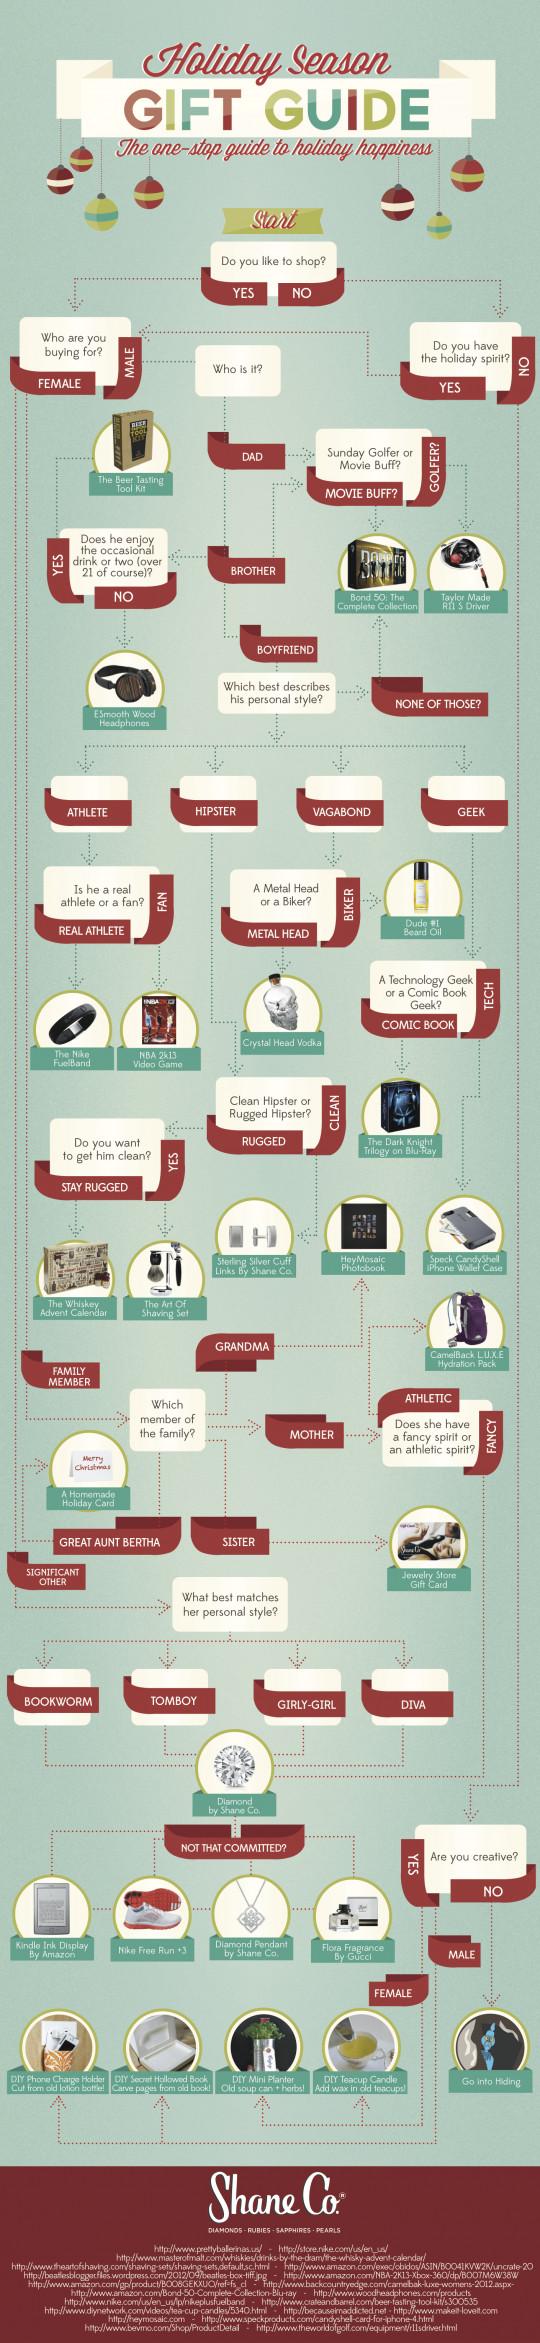 Holiday Season Gift Guide